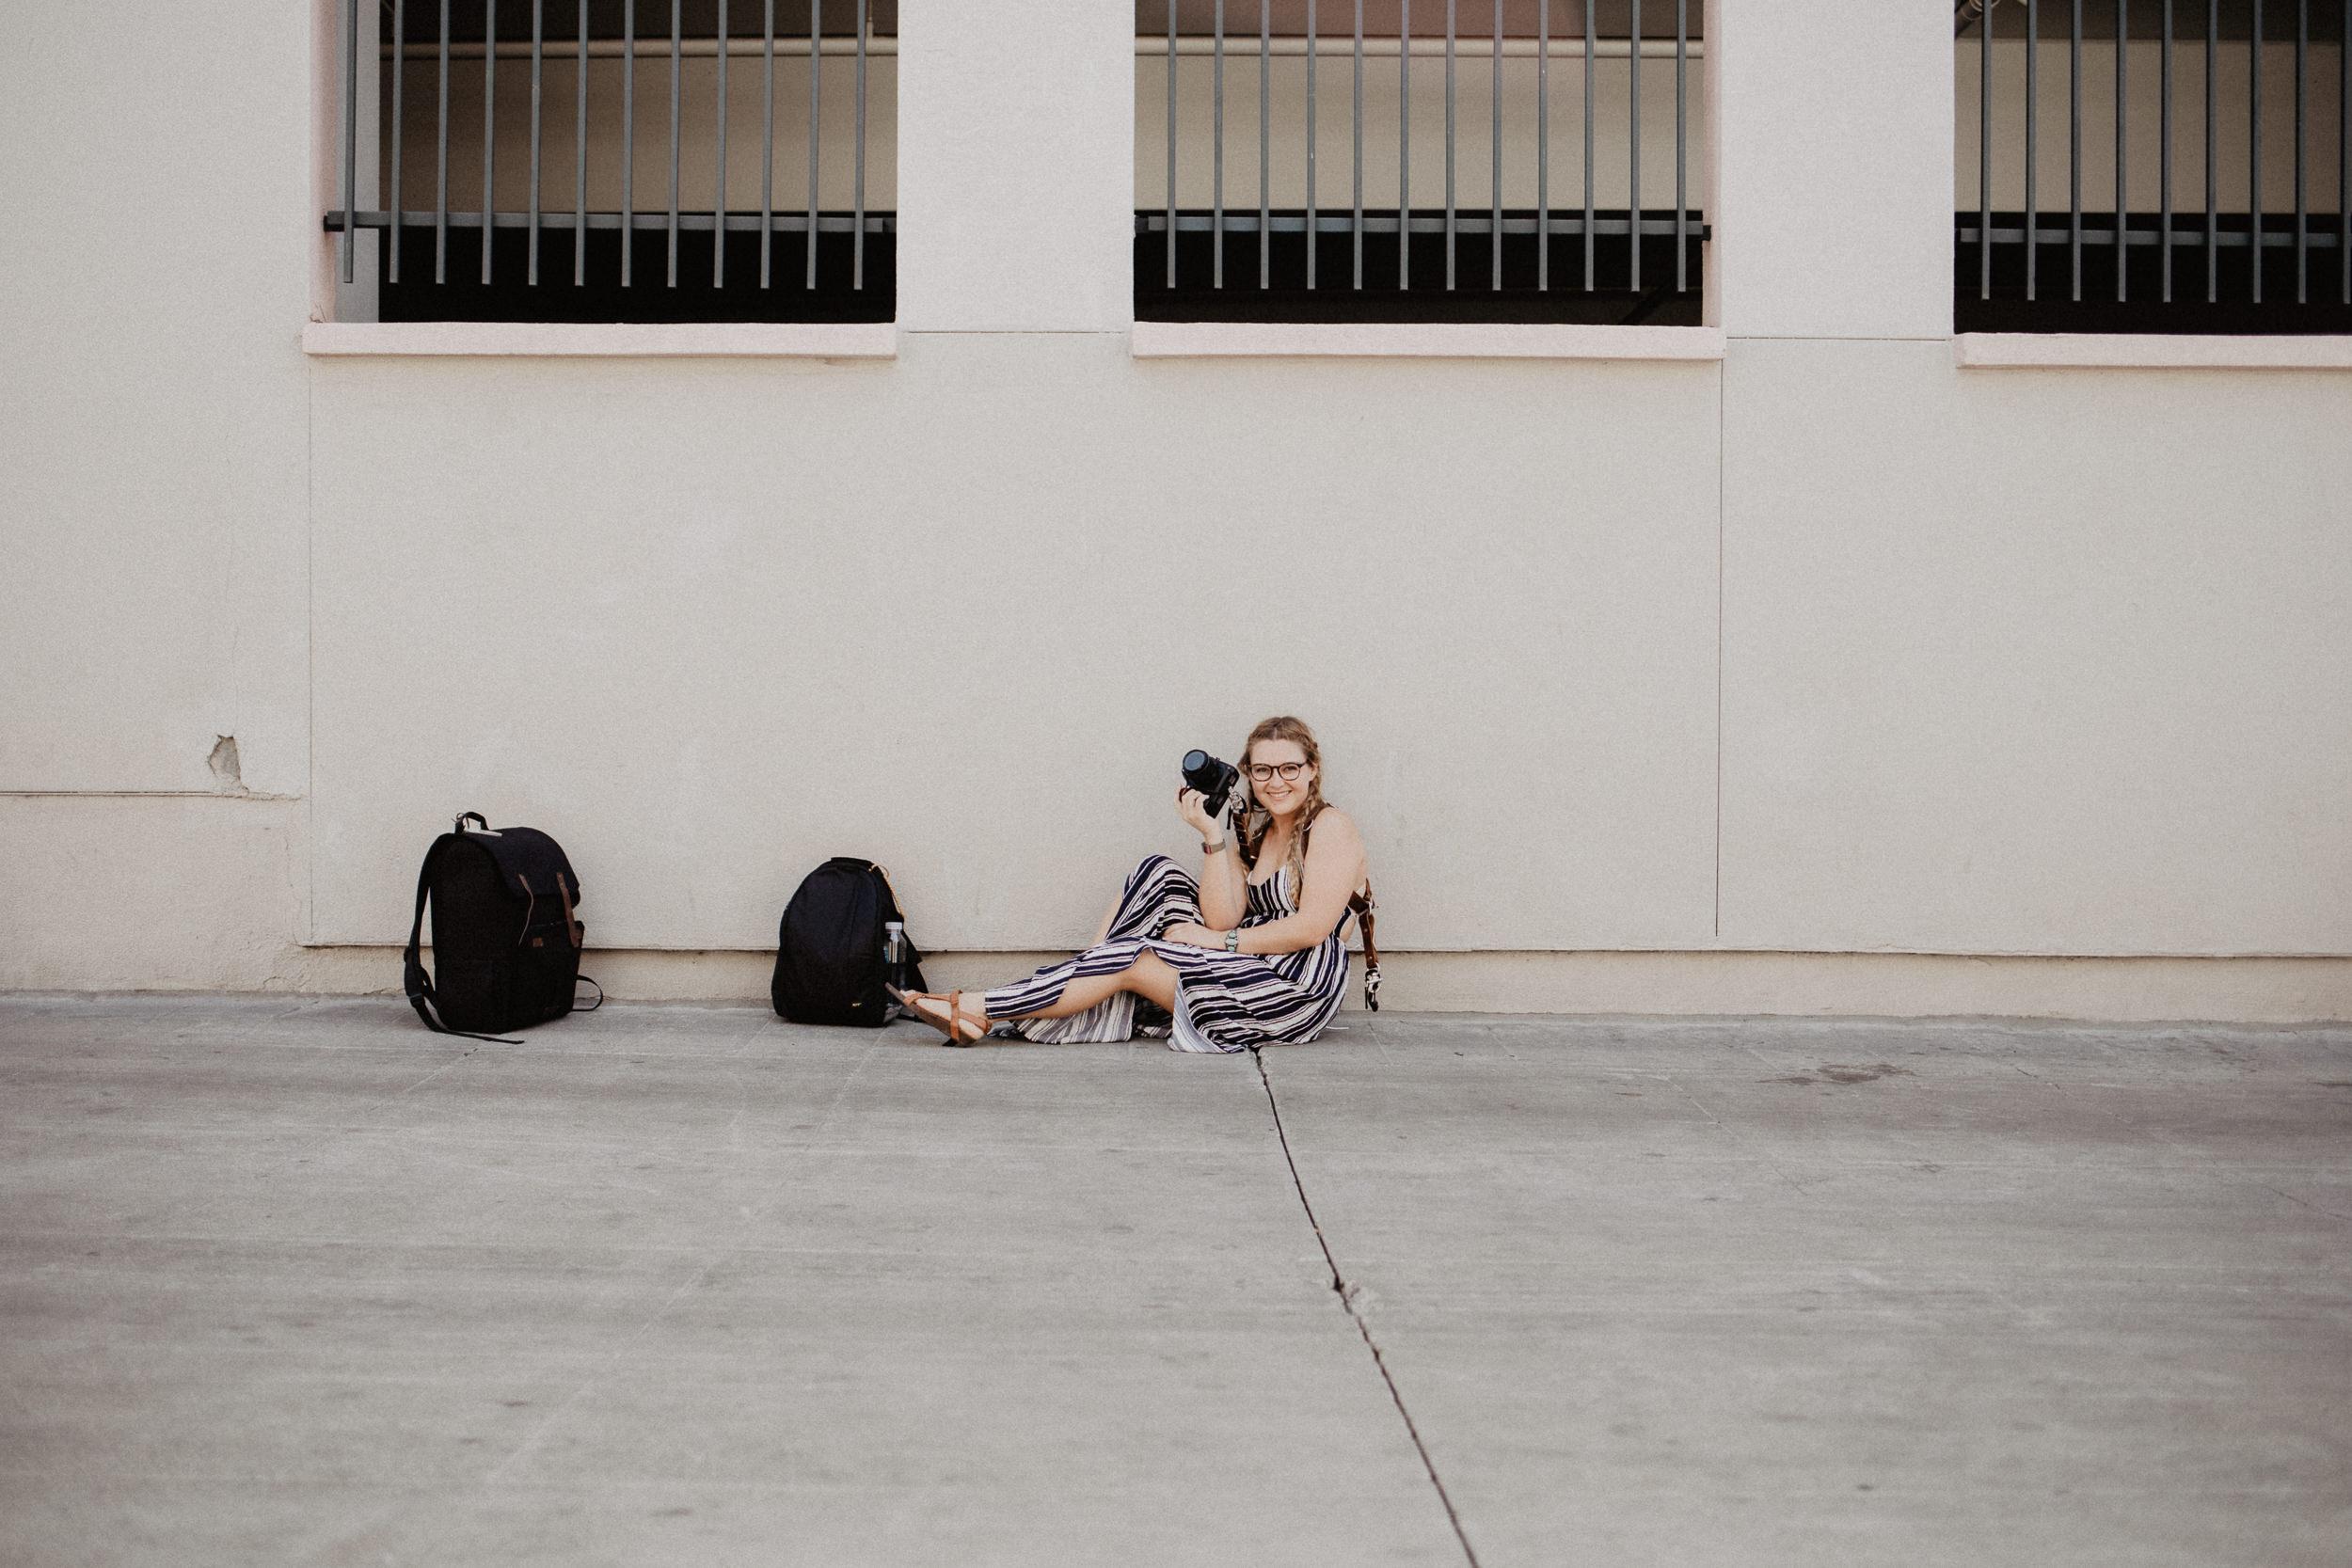 sPortraits of Me by Crystal-9.jpg